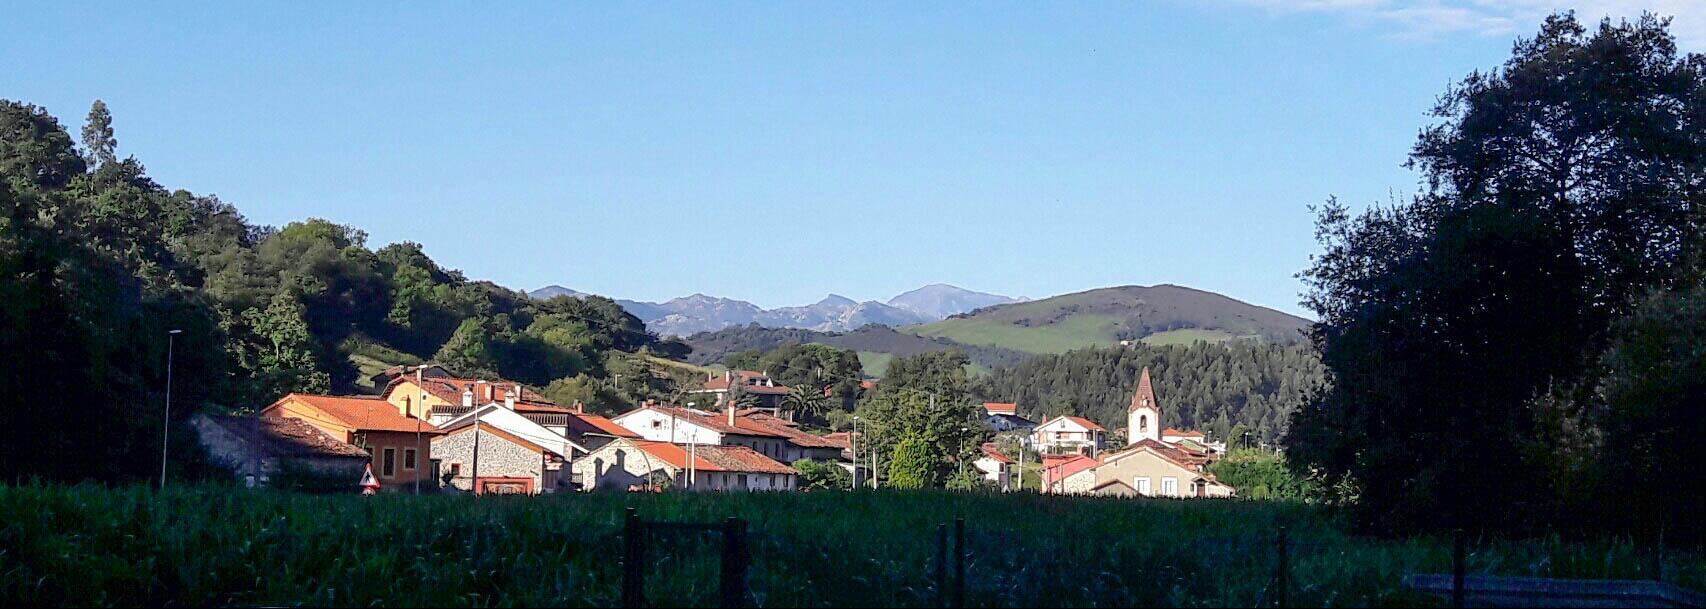 Muñorrodero, Cantabria